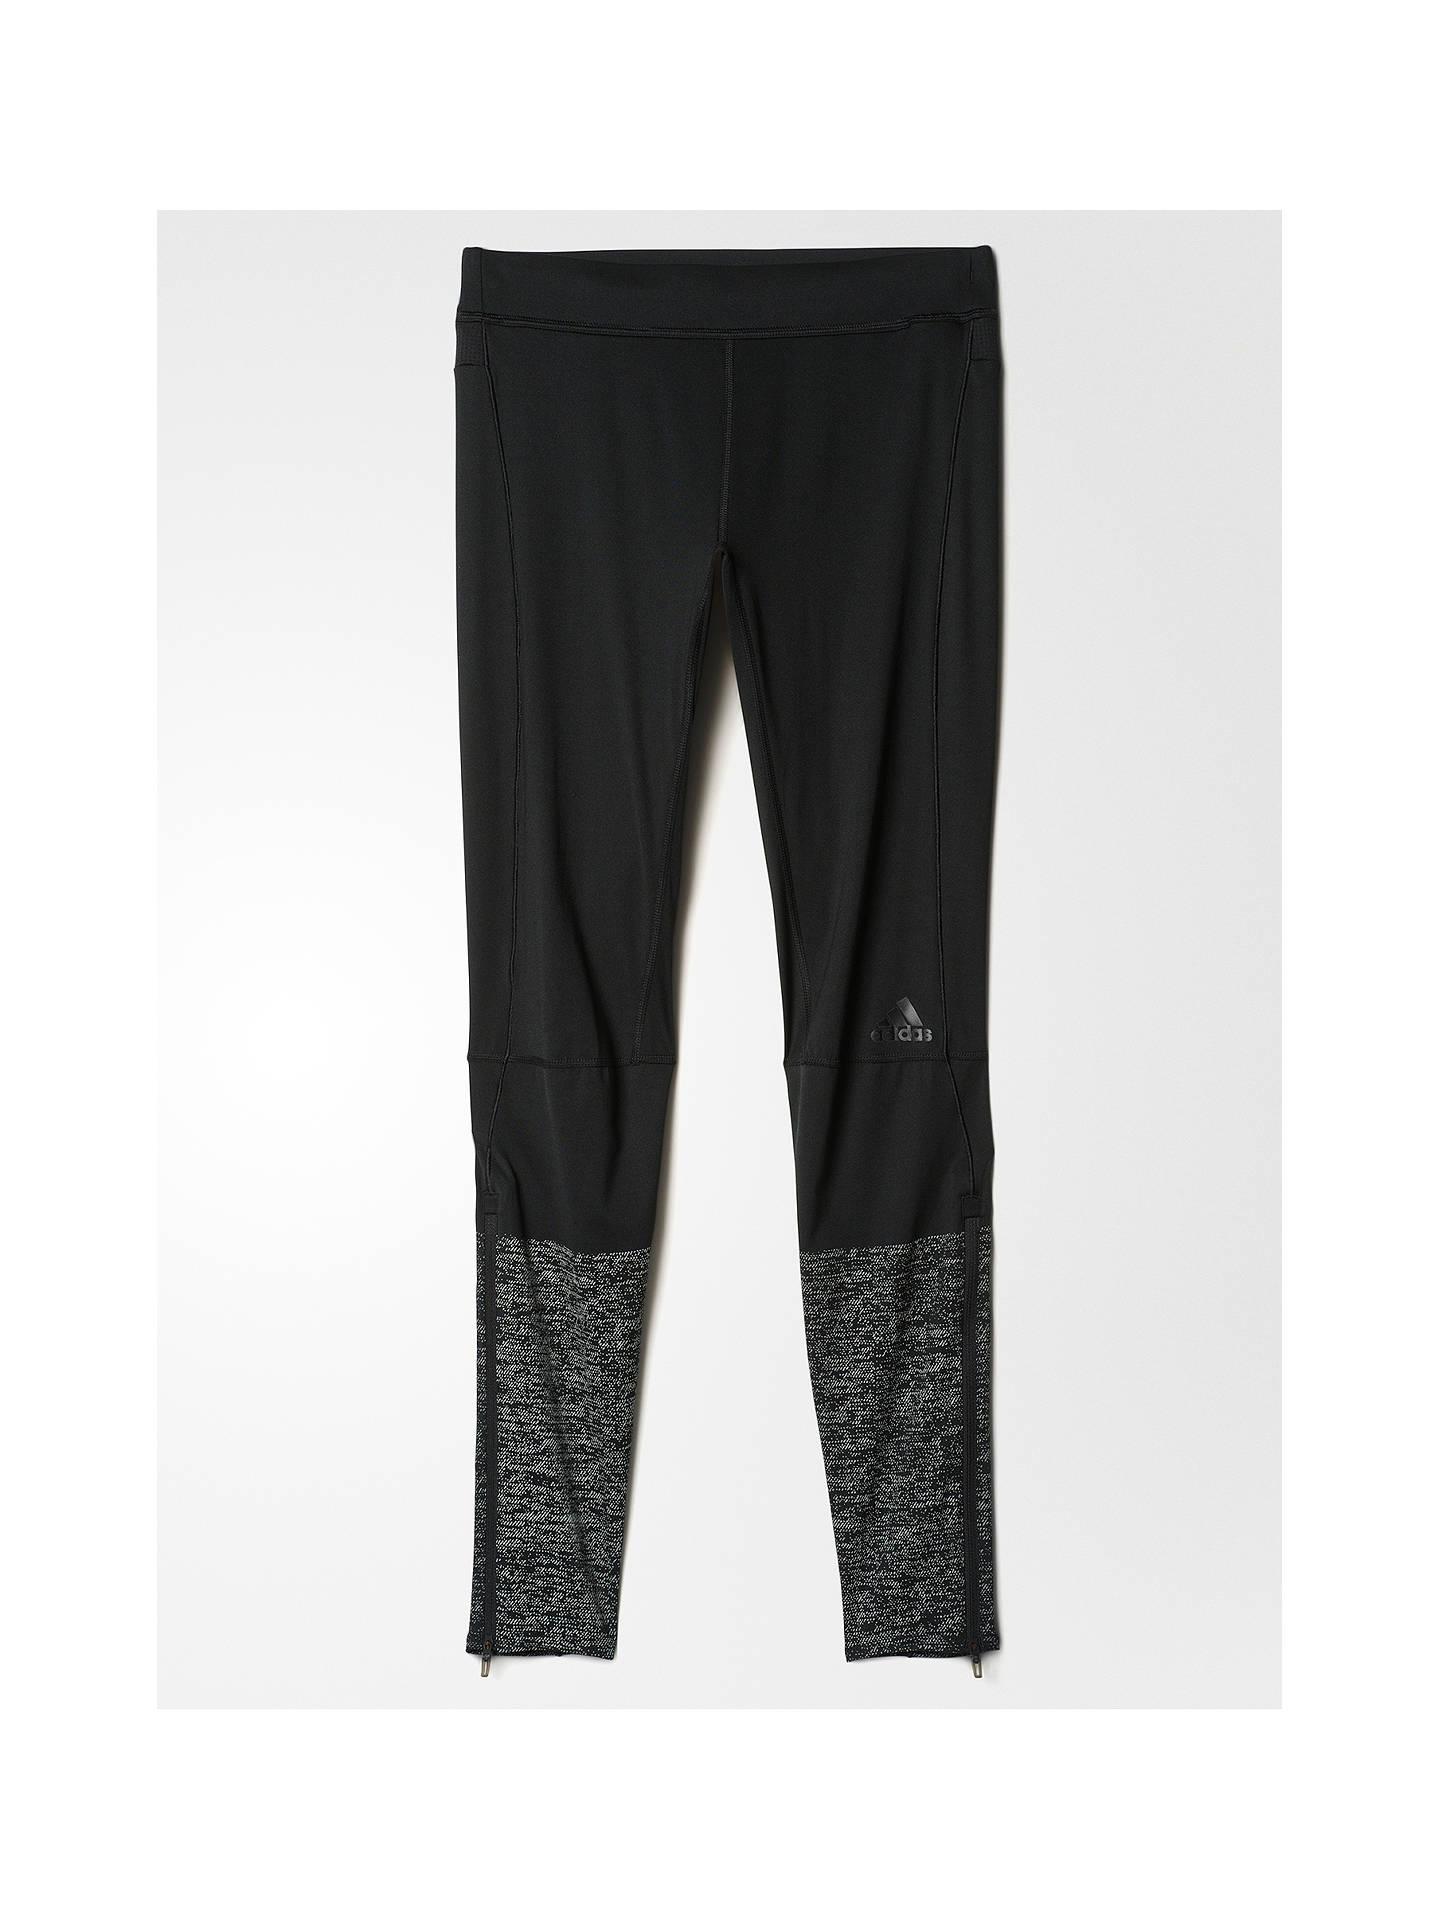 166f72d01 Buy Adidas Supernova Men s Heathered Long Running Tights